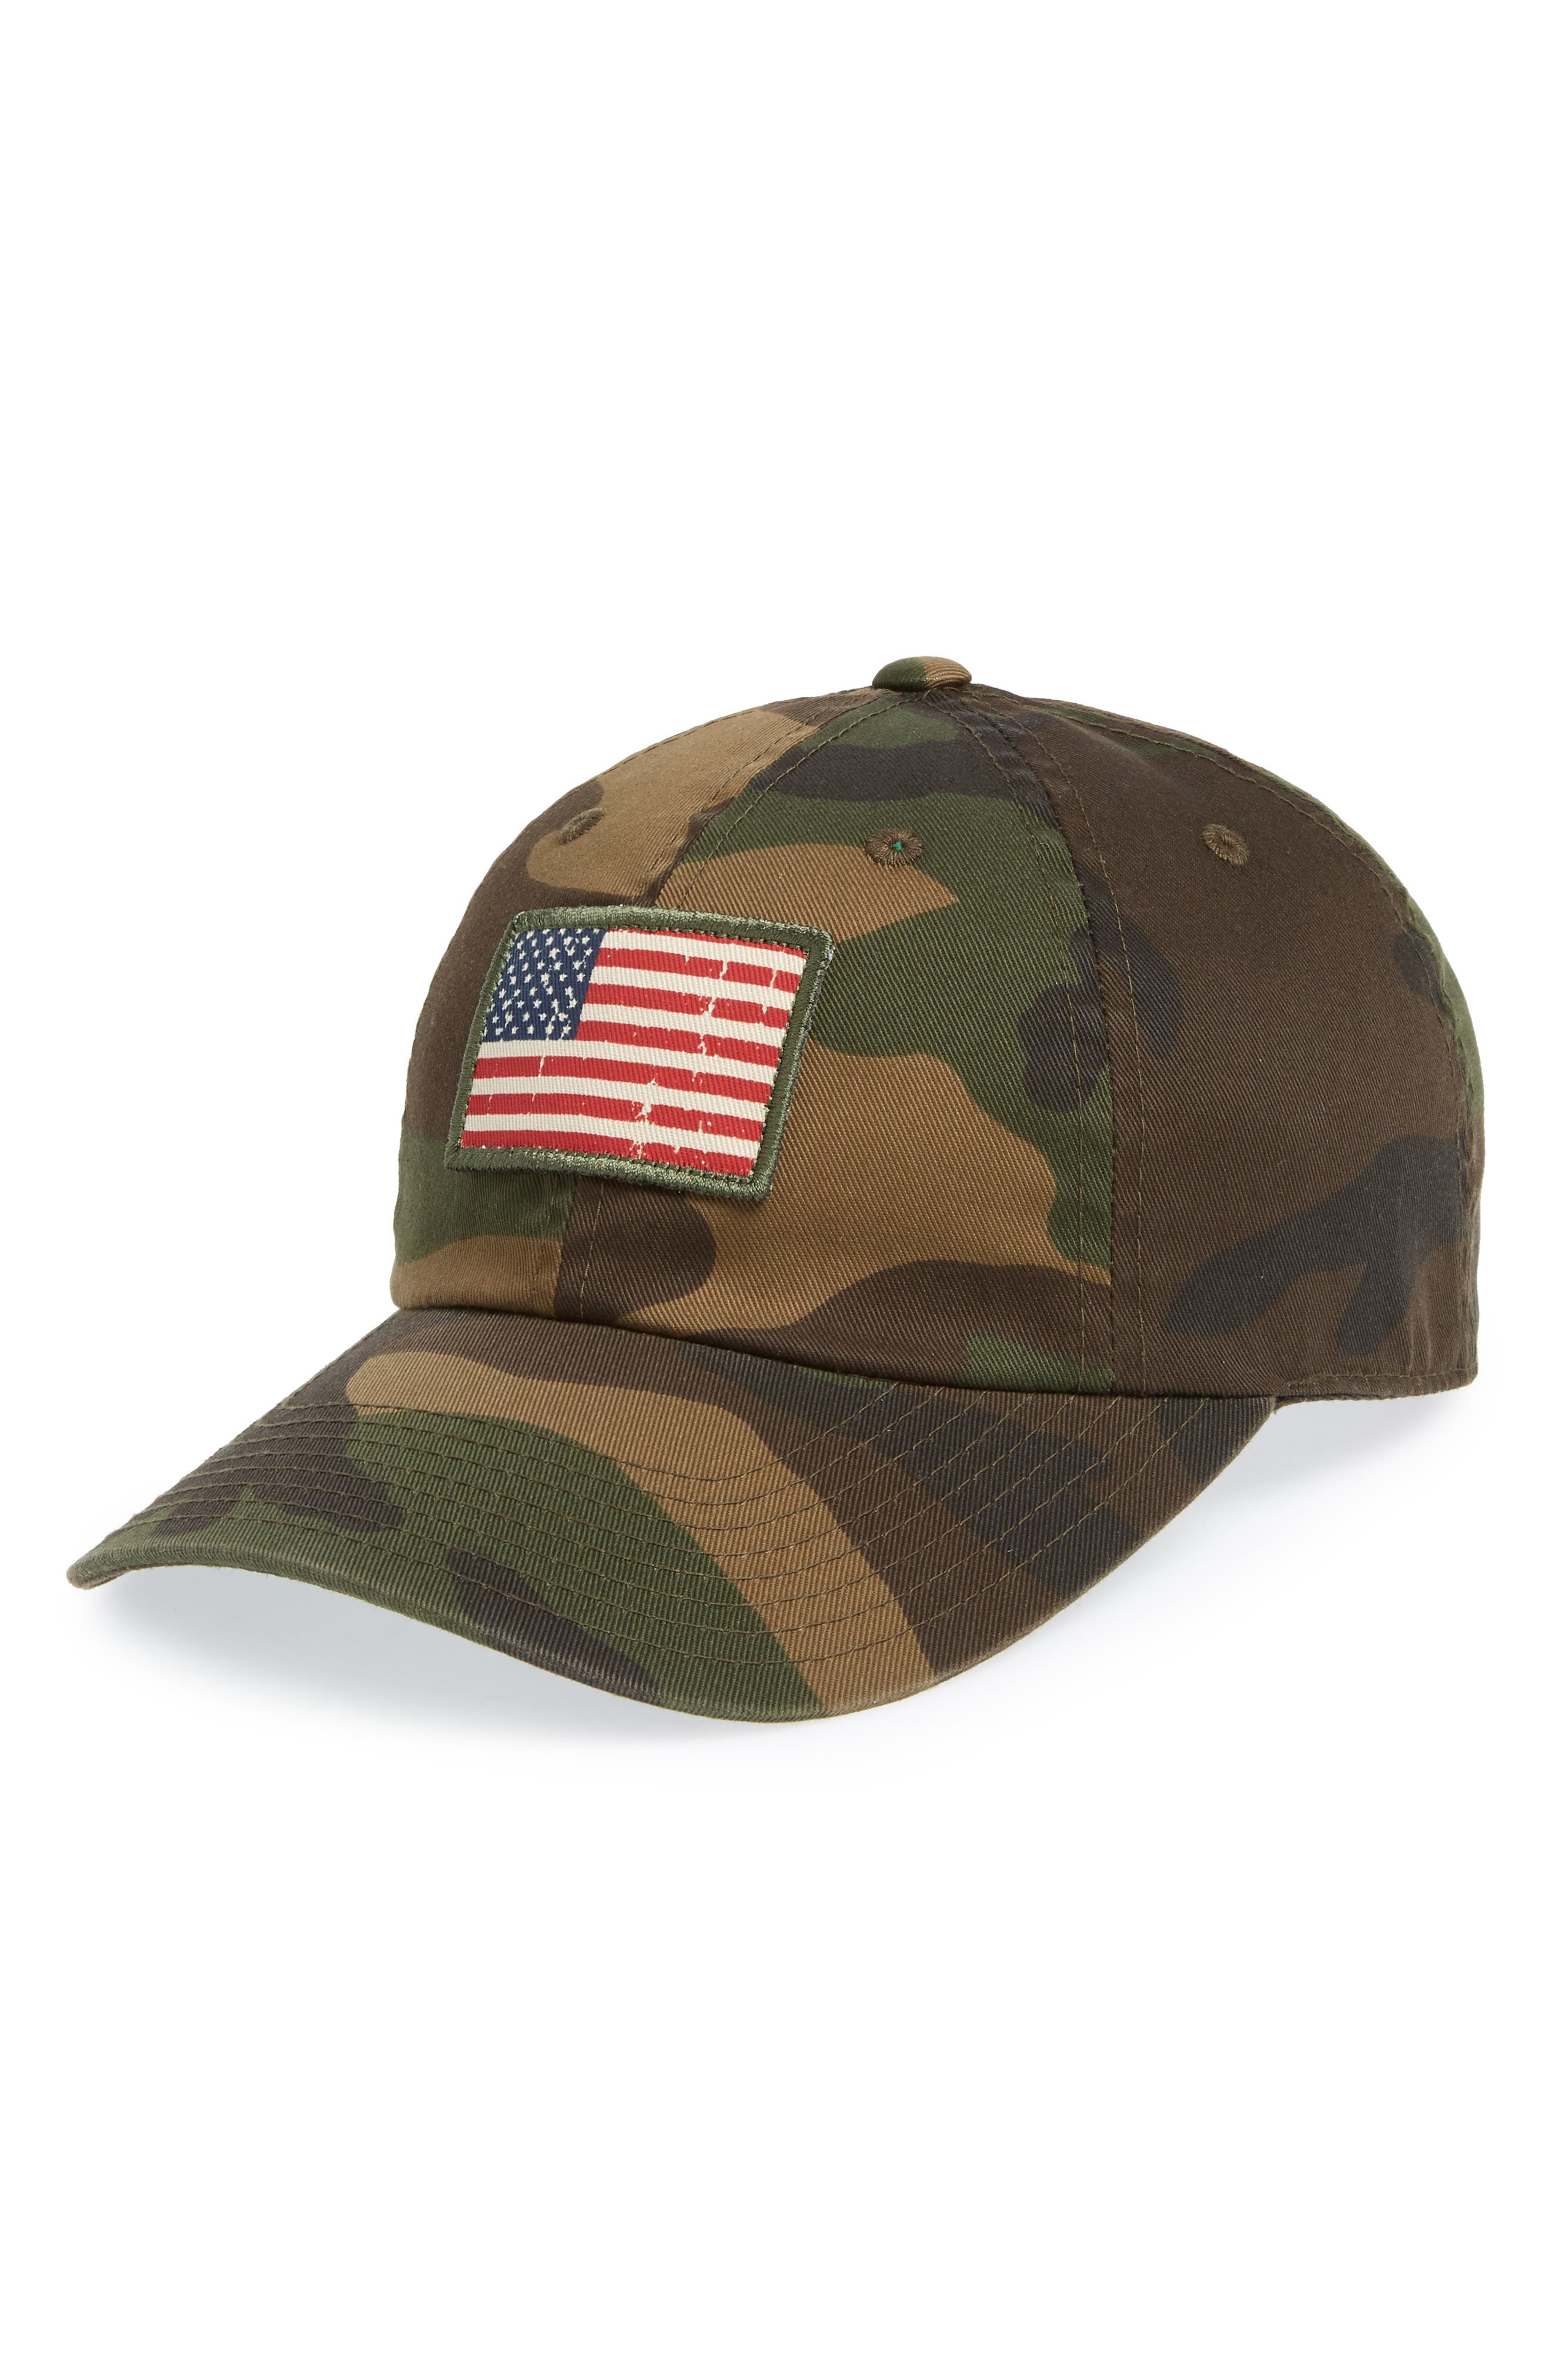 Badger - USA Ball Cap,                             Main thumbnail 1, color,                             312